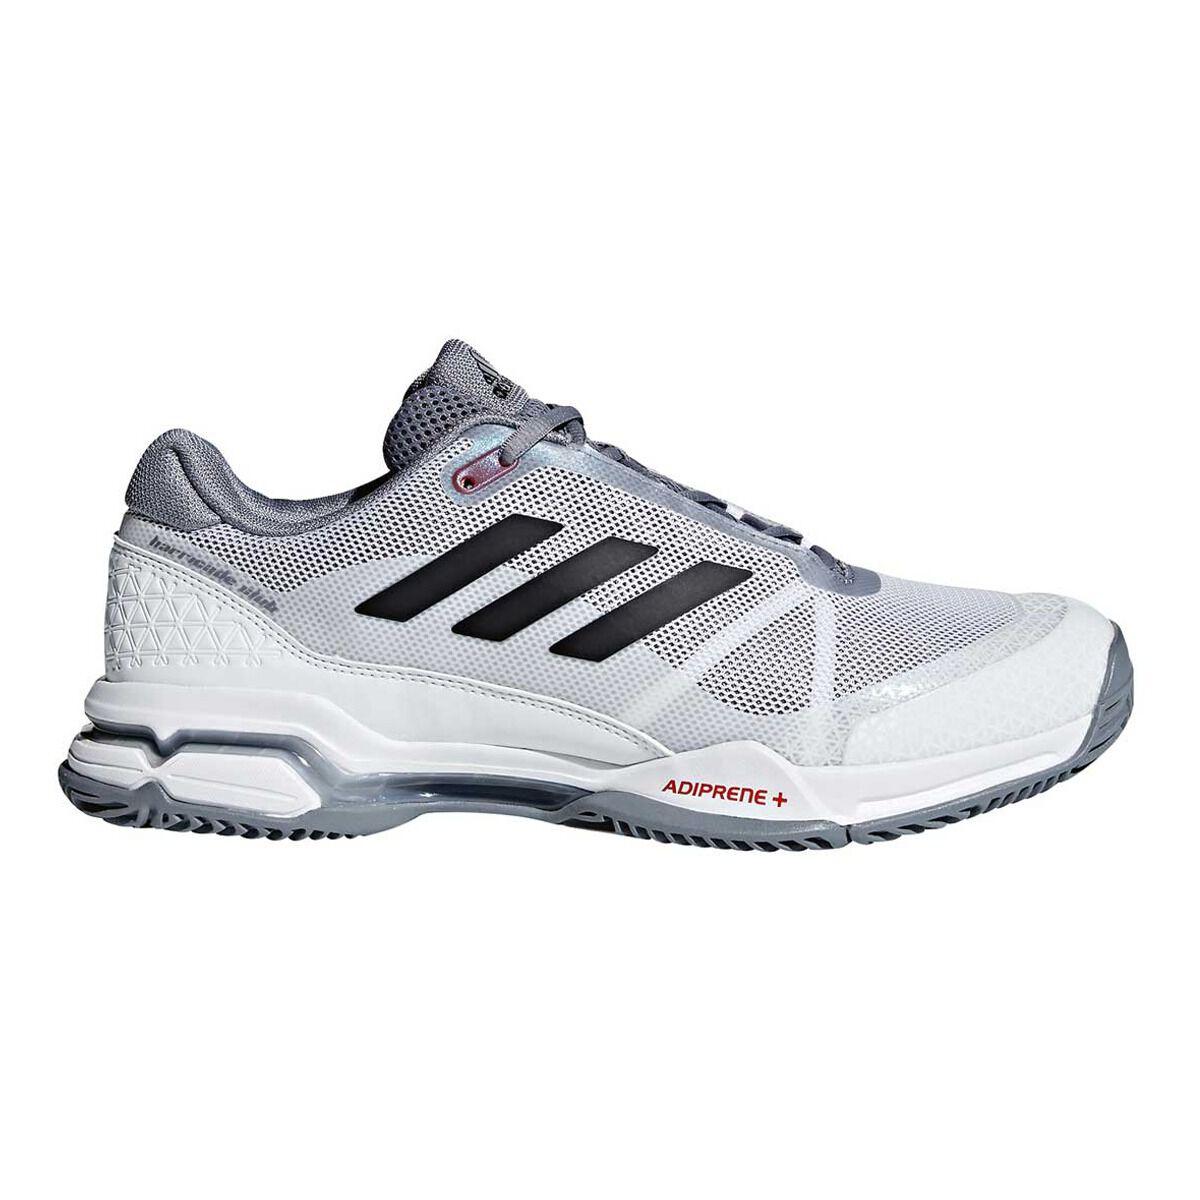 adidas Barricade Club Mens Tennis Shoes